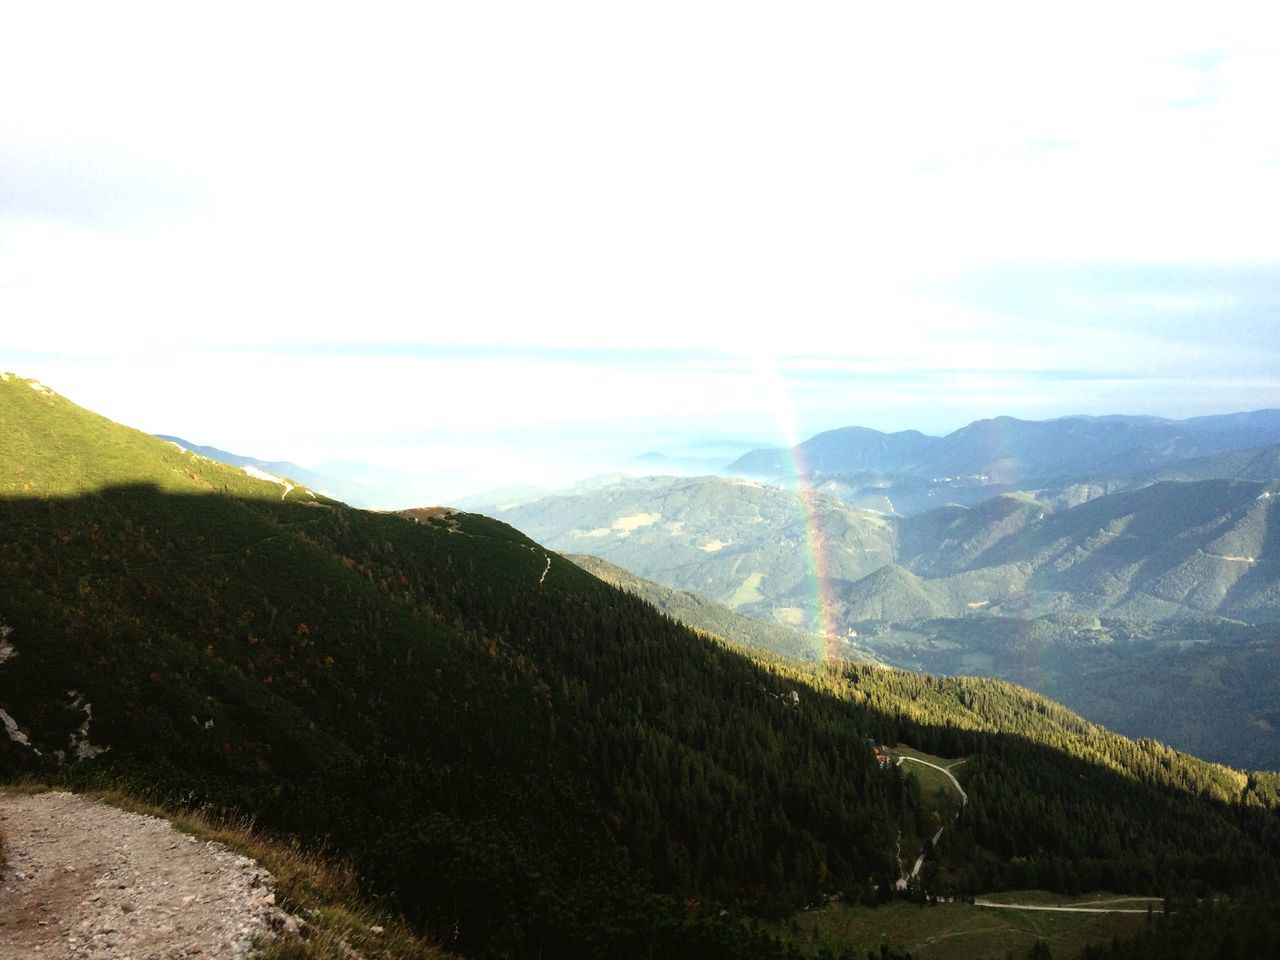 Beautiful stock photos of regenbogen, tranquil scene, scenics, tranquility, landscape